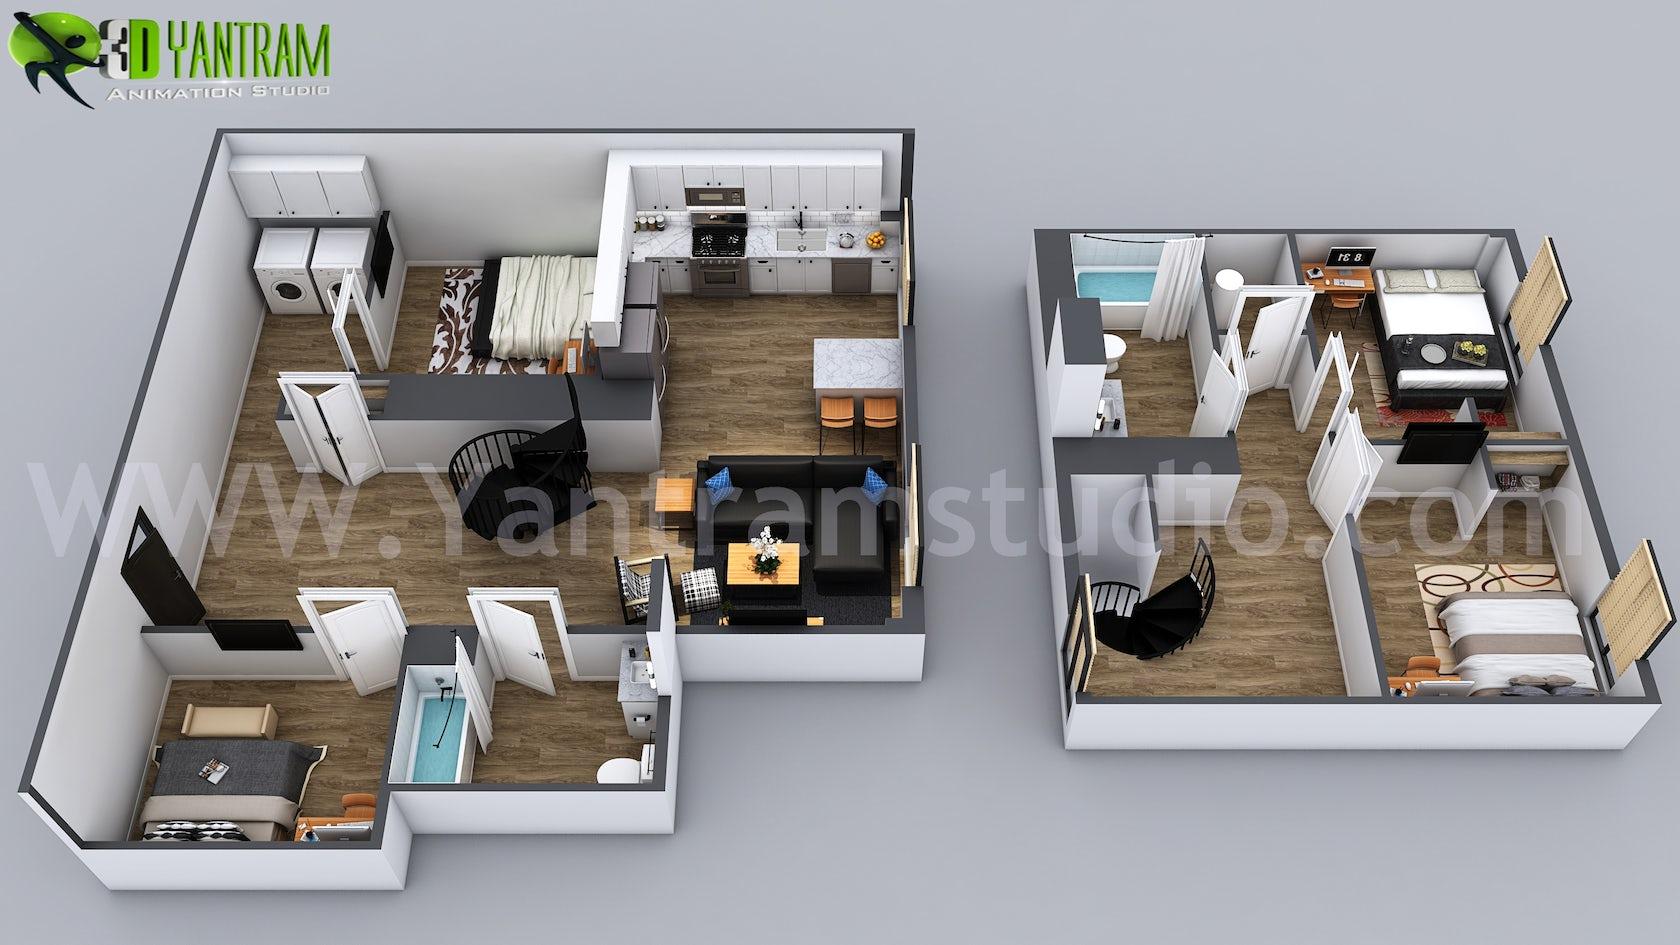 3D Home Floor Plan Designs By Yantram floor plan designer ...